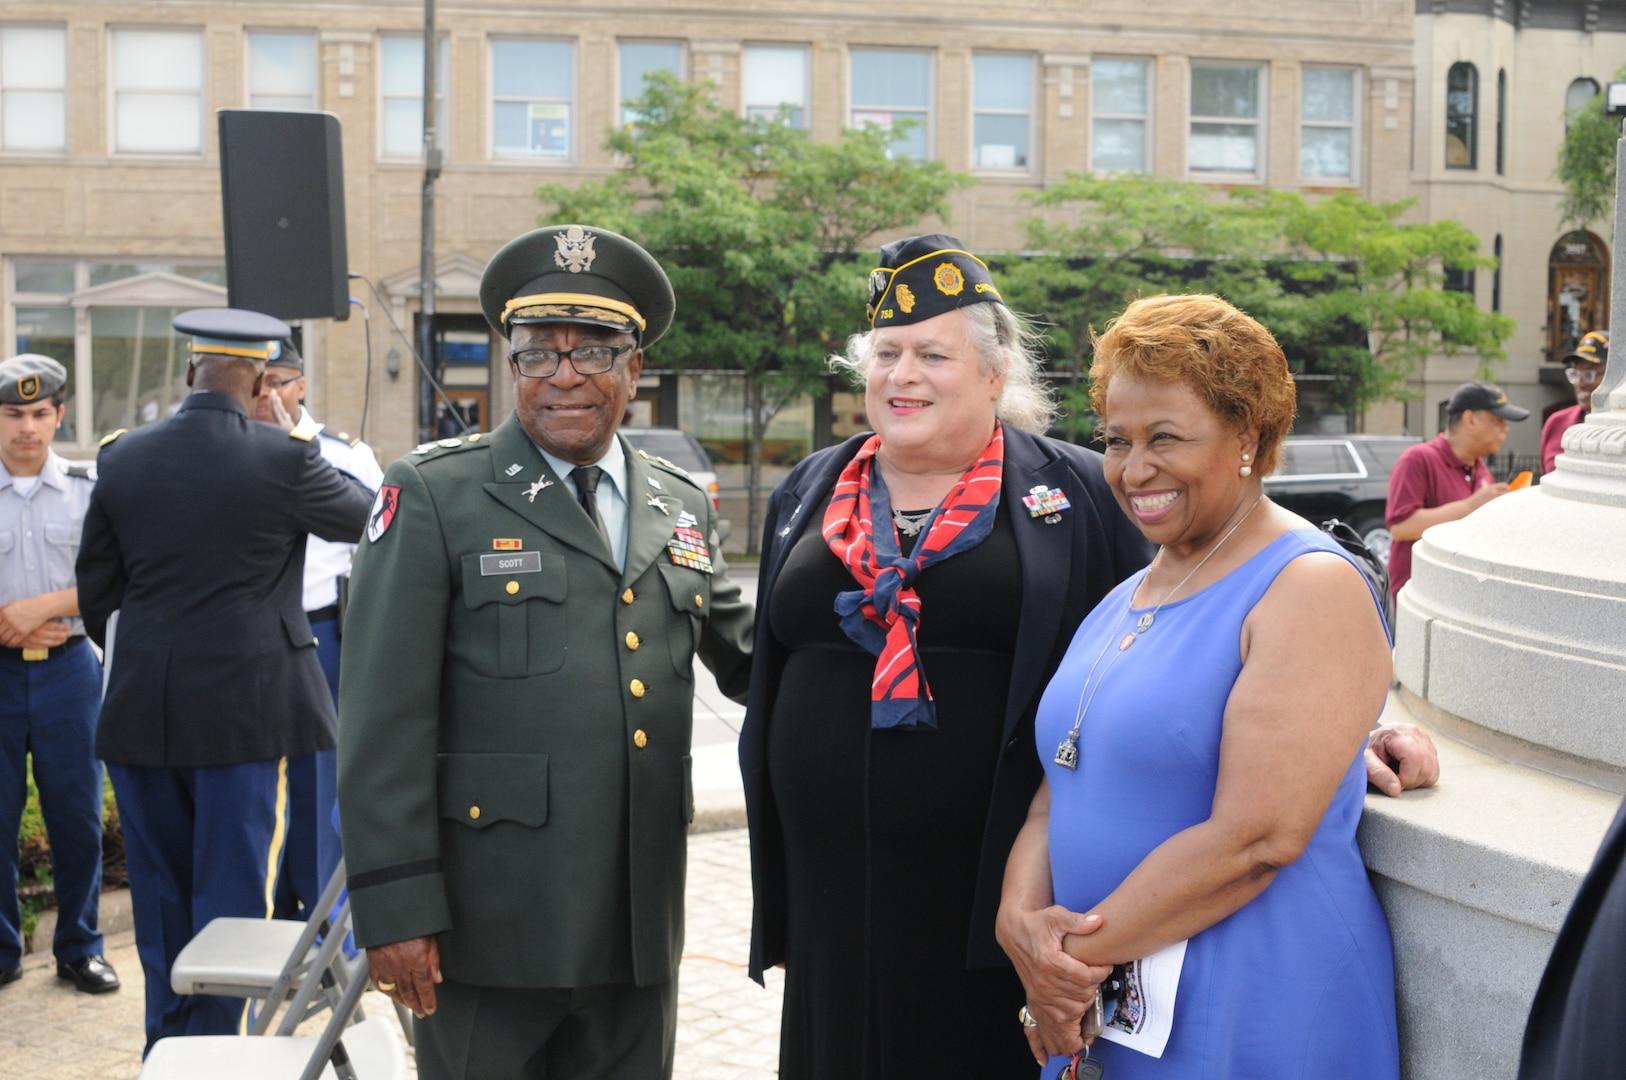 Col. (ret.) Eugene F. Scott, Lt. Col. (ret.) Jennifer Pritzker, and former Ambassador and U.S. Senator Carol Moseley-Braun